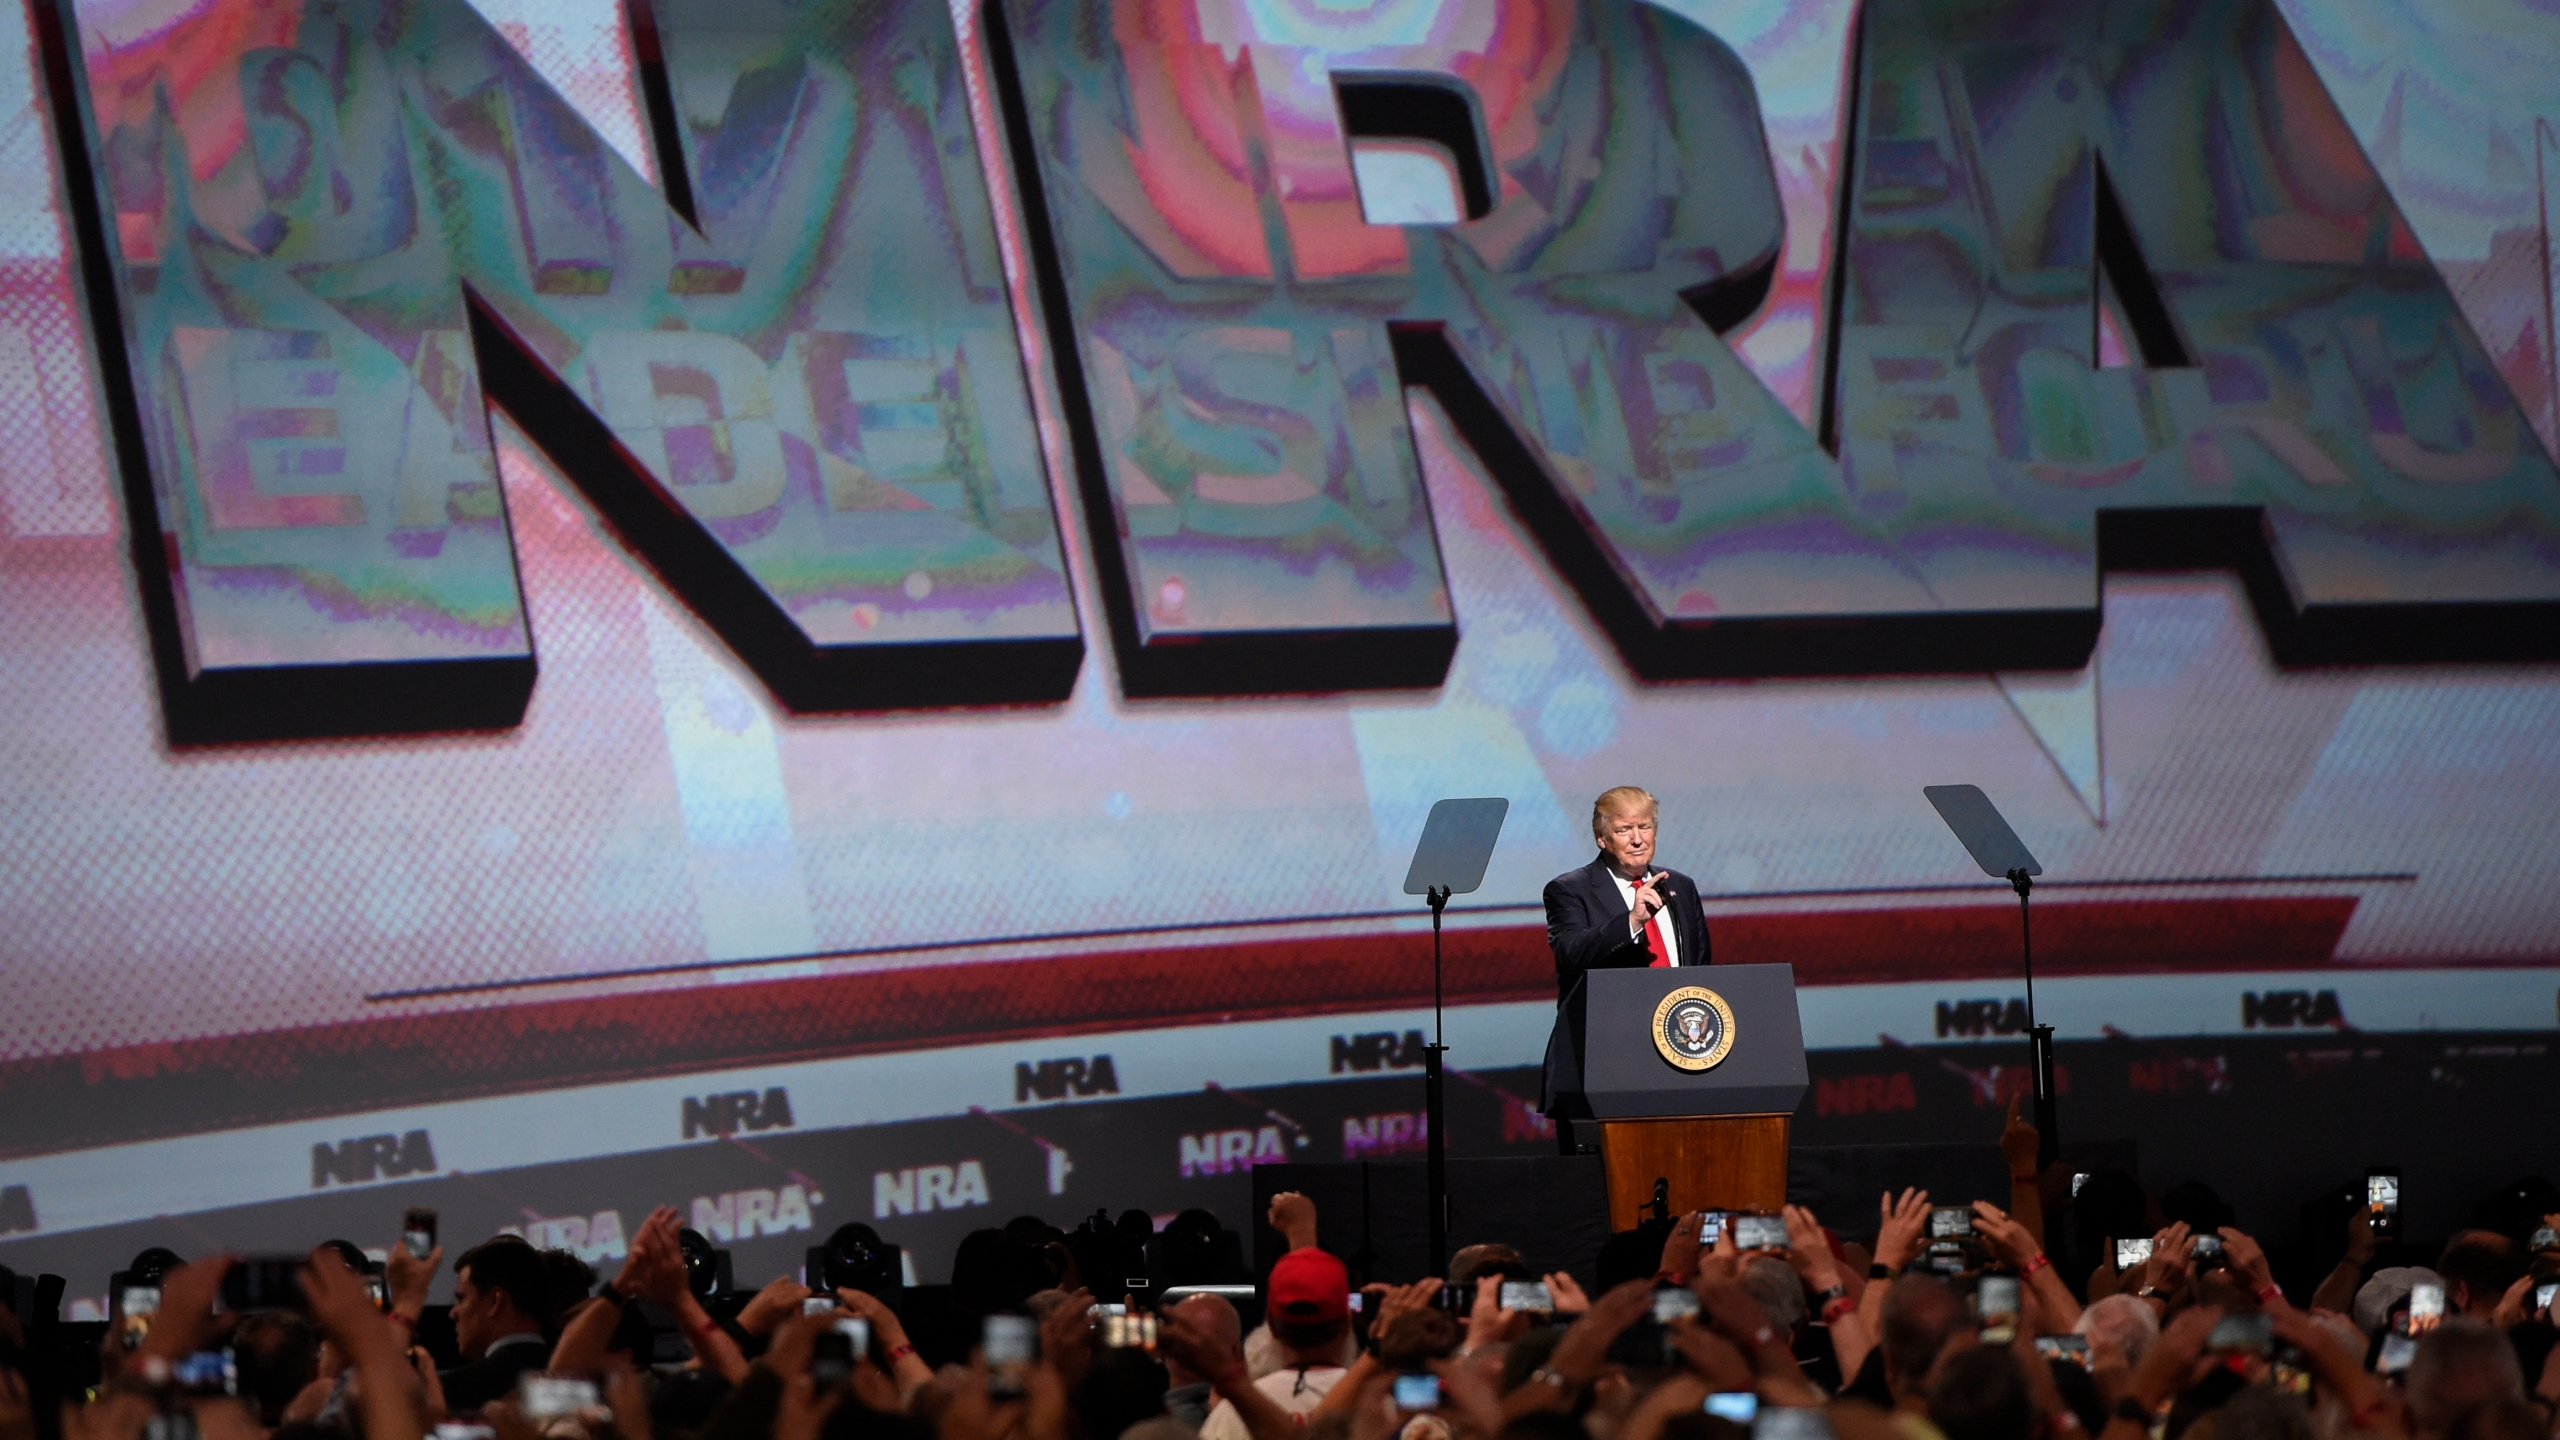 NRA_Meeting_Gun_Politics_76130-159532.jpg32396086